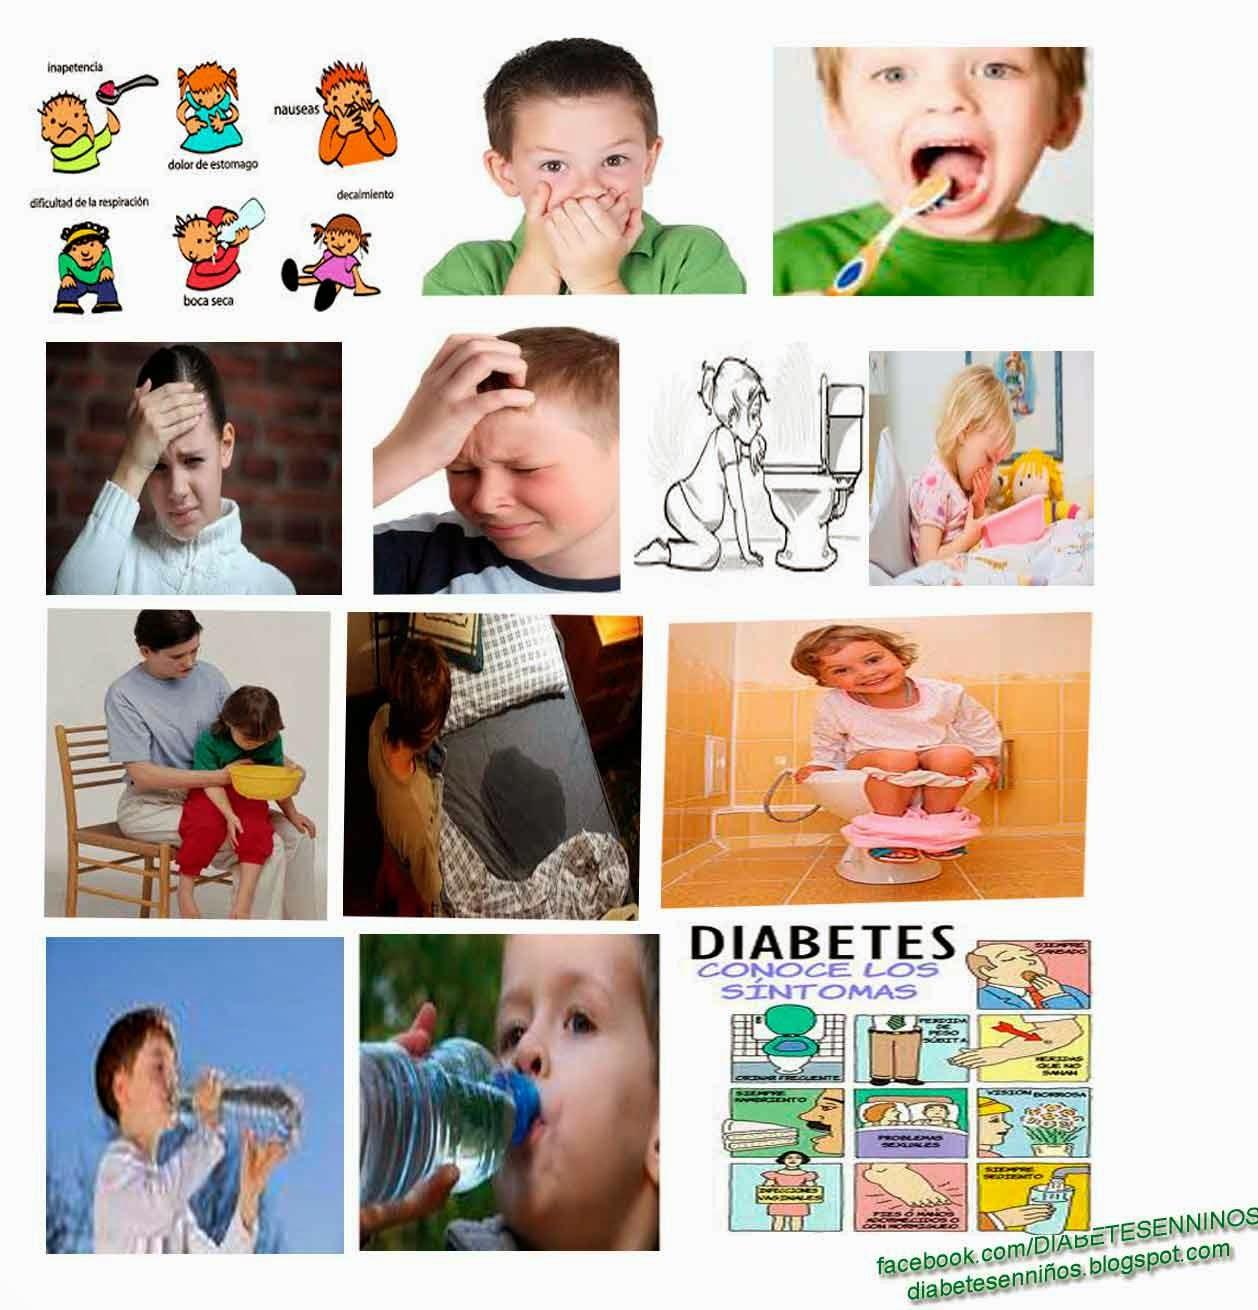 LA DIABETES MELLITUS,  DIABTES TIPO 1, DIABETES TIPO2, DIABETES GESTACIONAL